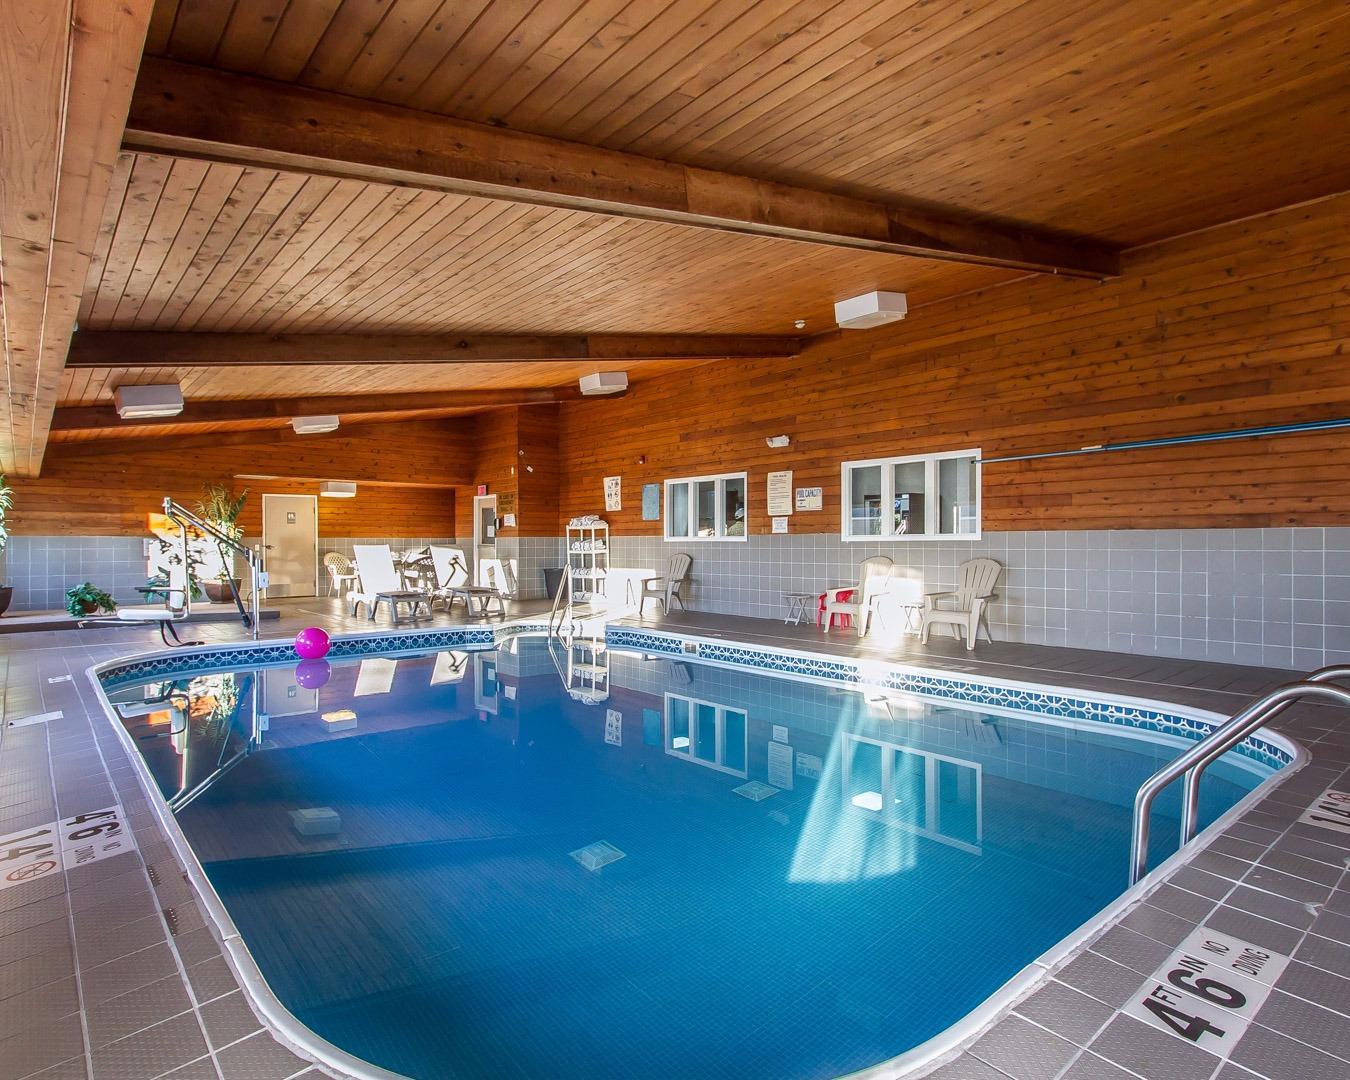 Comfort Inn, Oskaloosa IA